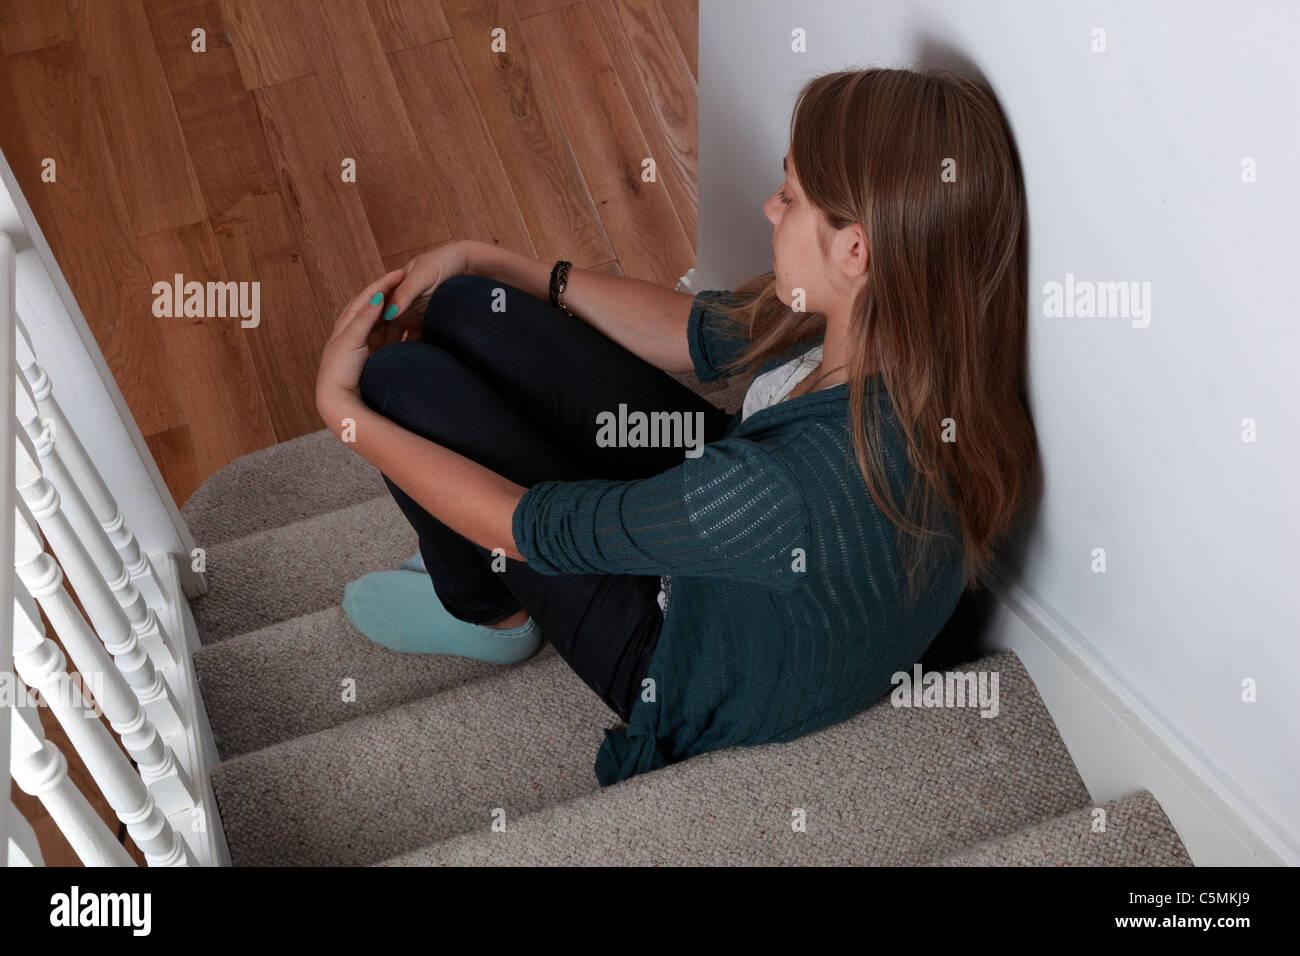 knees social stock photos knees social stock images alamy. Black Bedroom Furniture Sets. Home Design Ideas